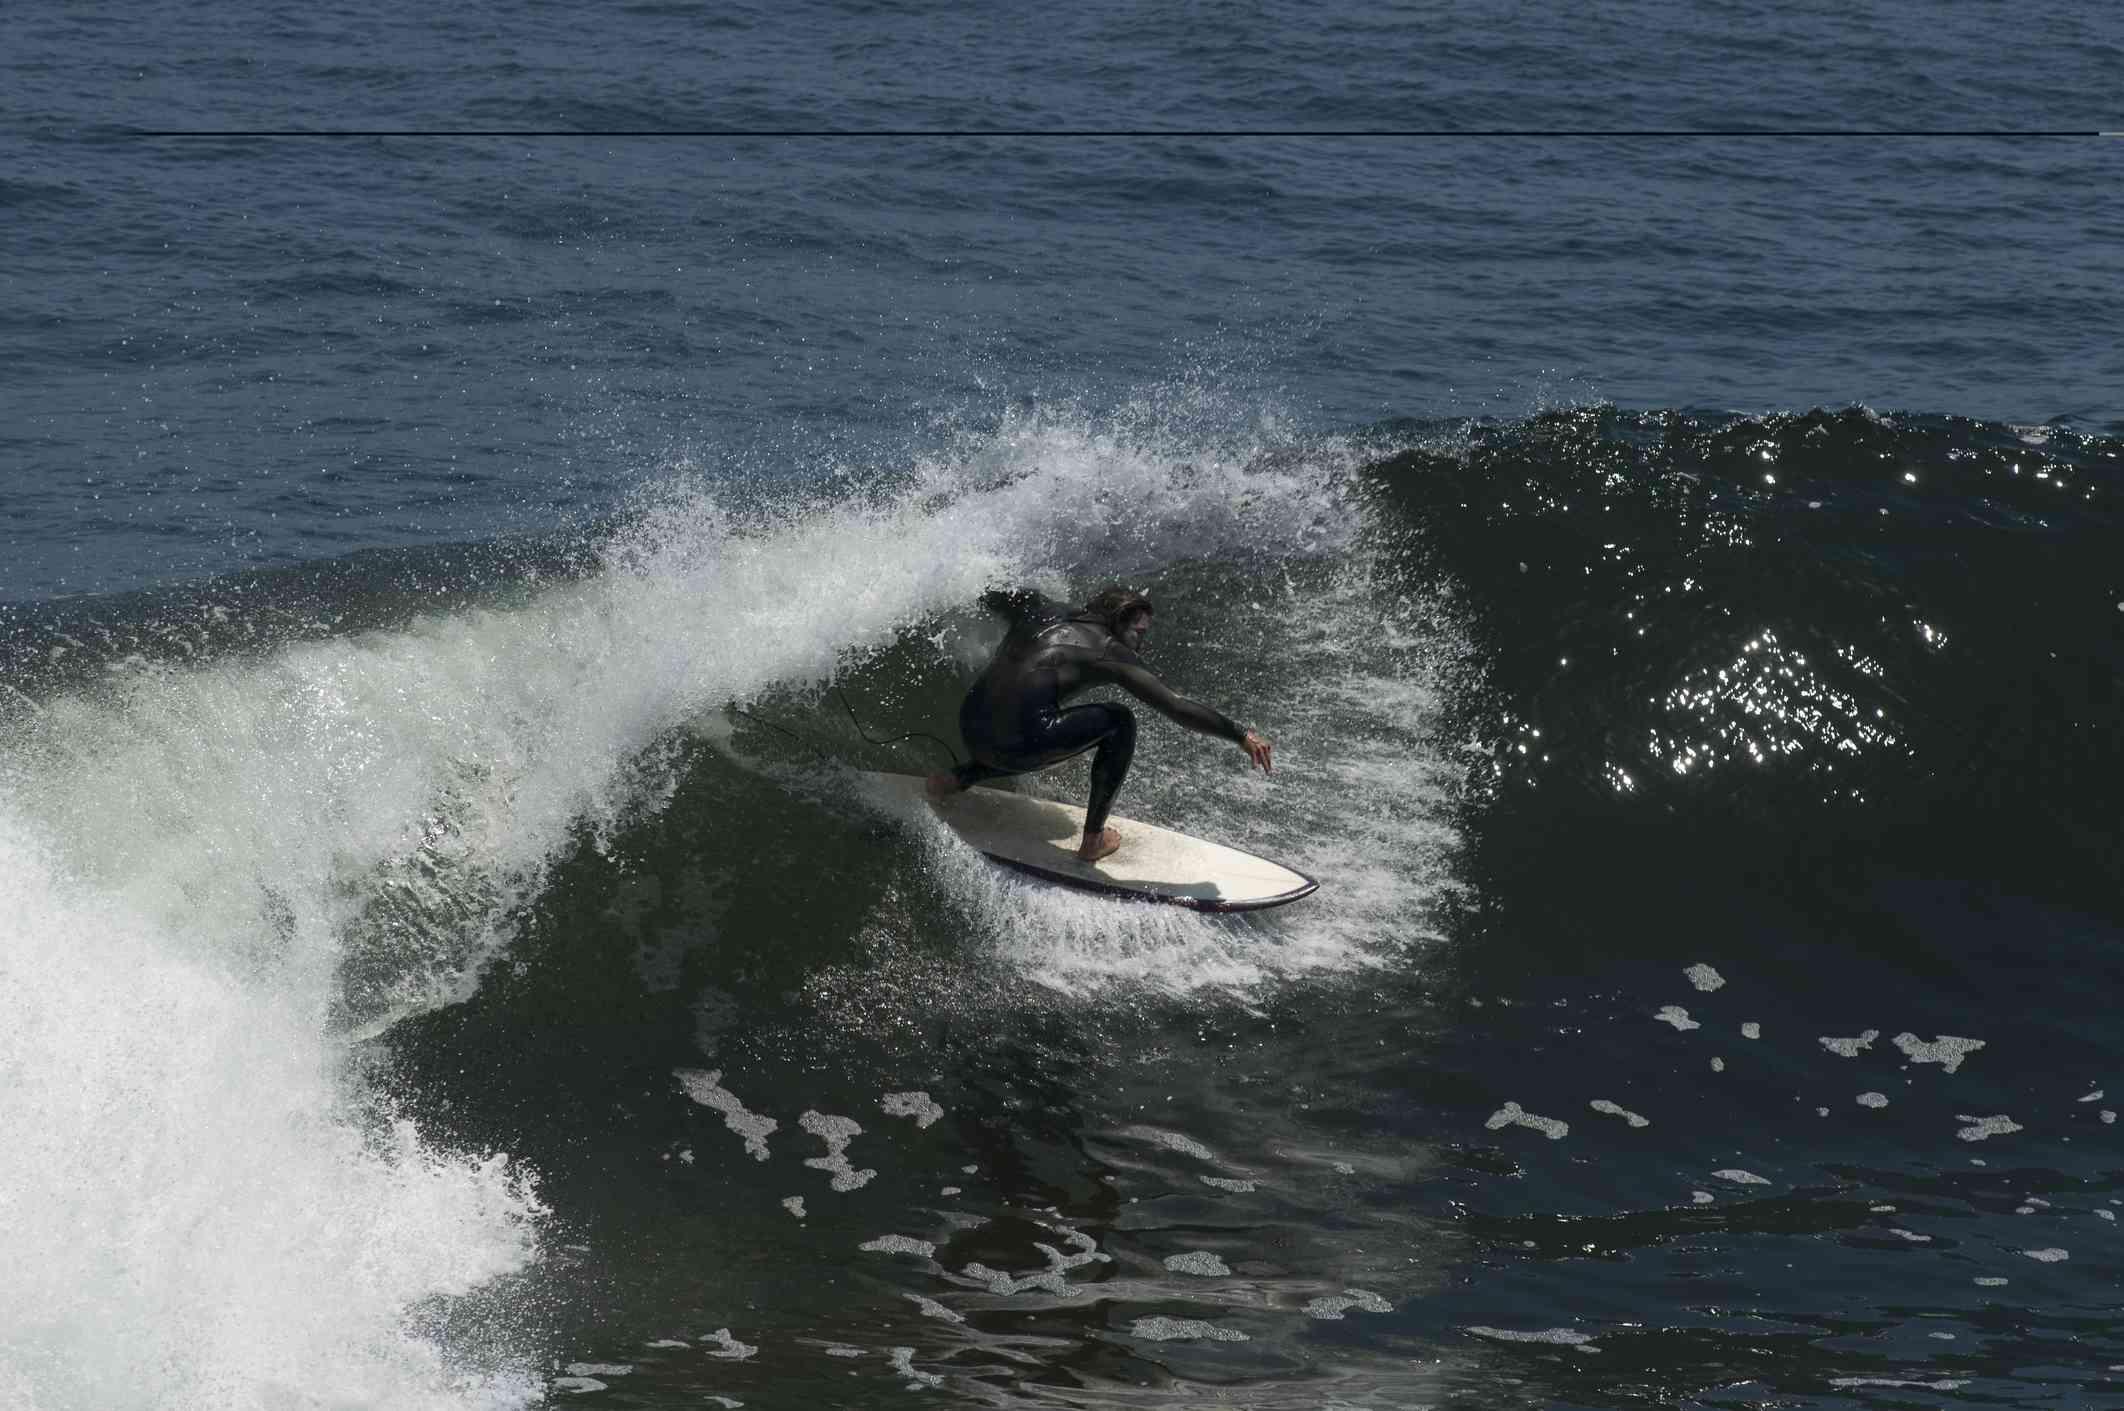 A man wearing a wetsuit surfing Punta de Lobos, Pichilemu, Chile